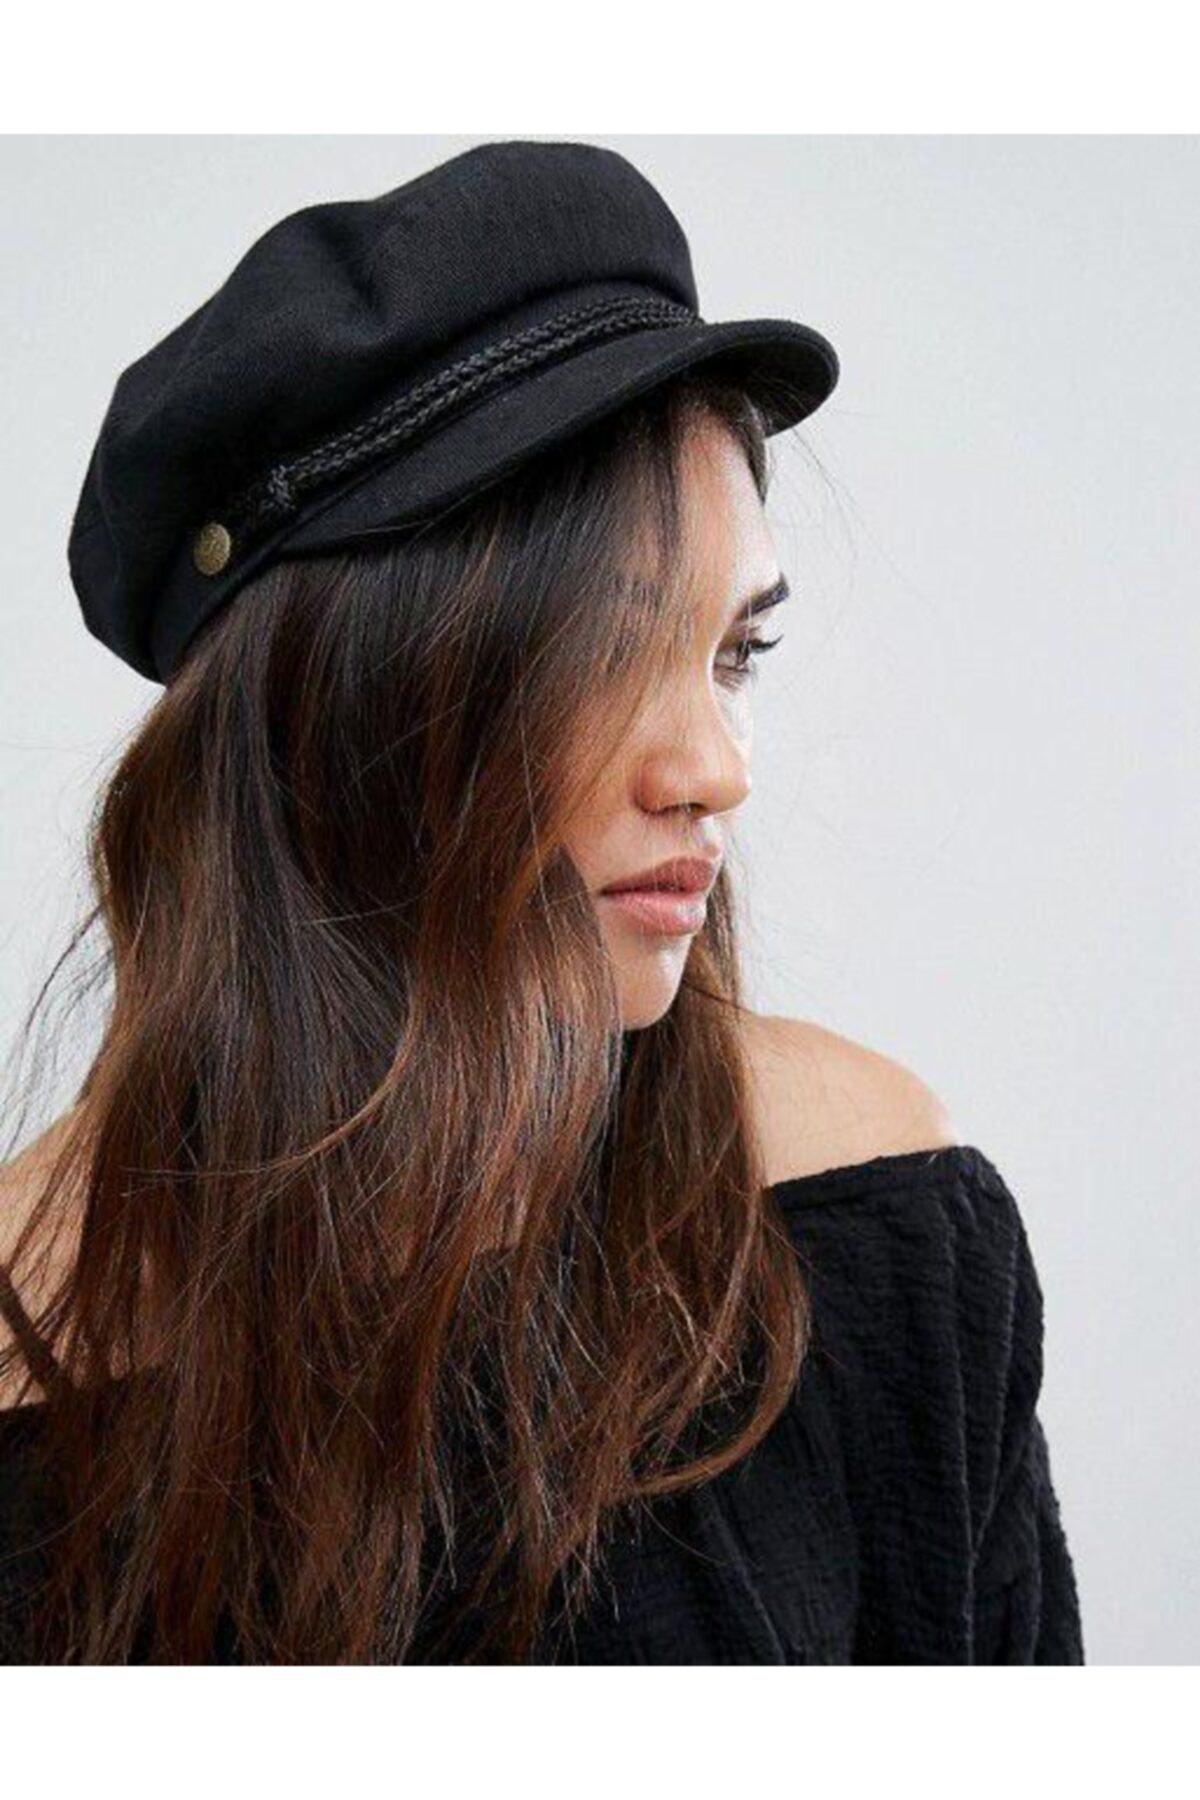 Mathilda Aksesuar Bayan Kasket Şapka Siyah 1